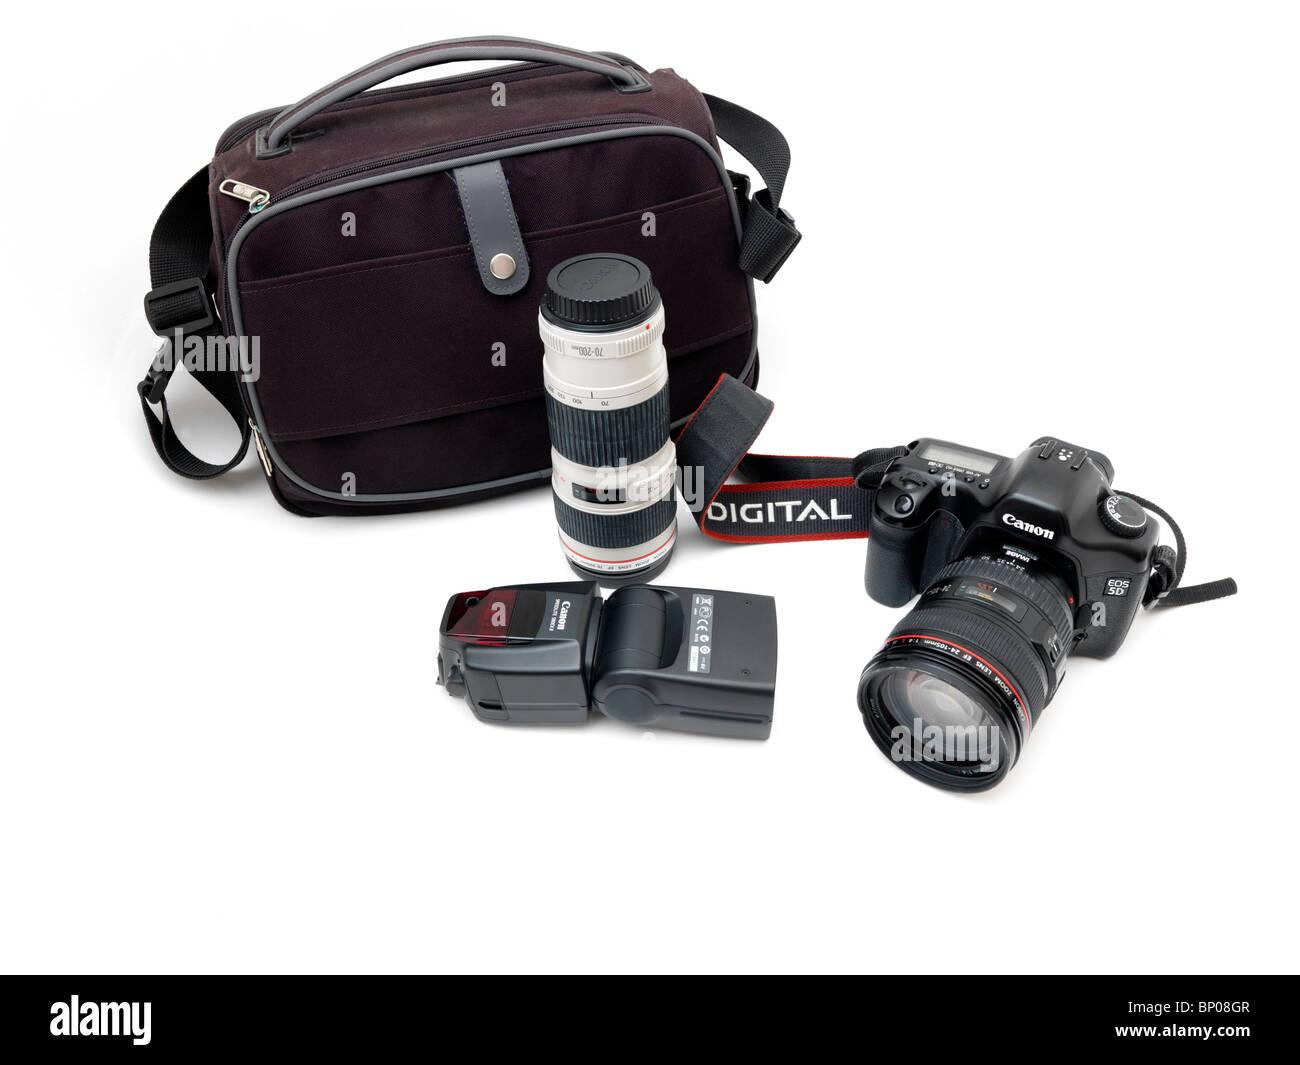 Canon Digital SLR kit - Stock Image